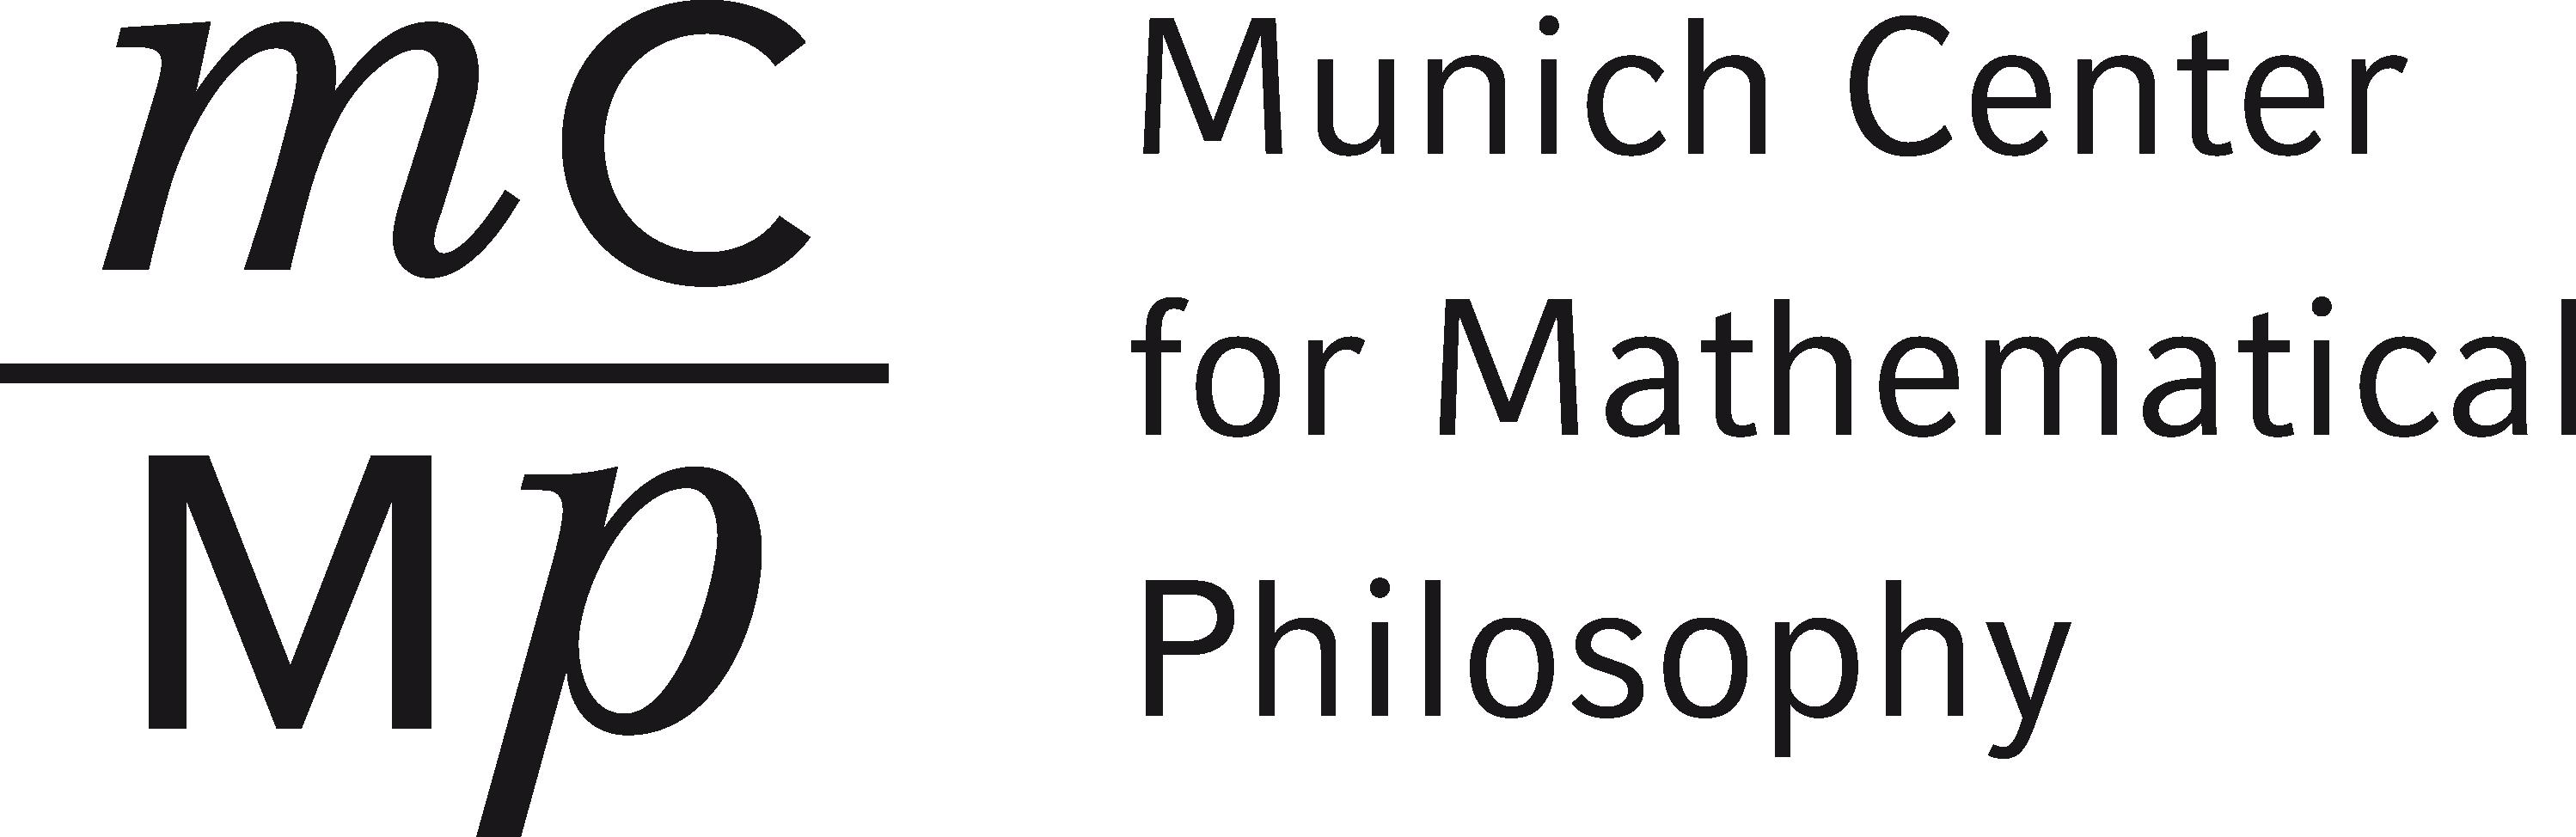 Munich Center for Mathematical Philosophy